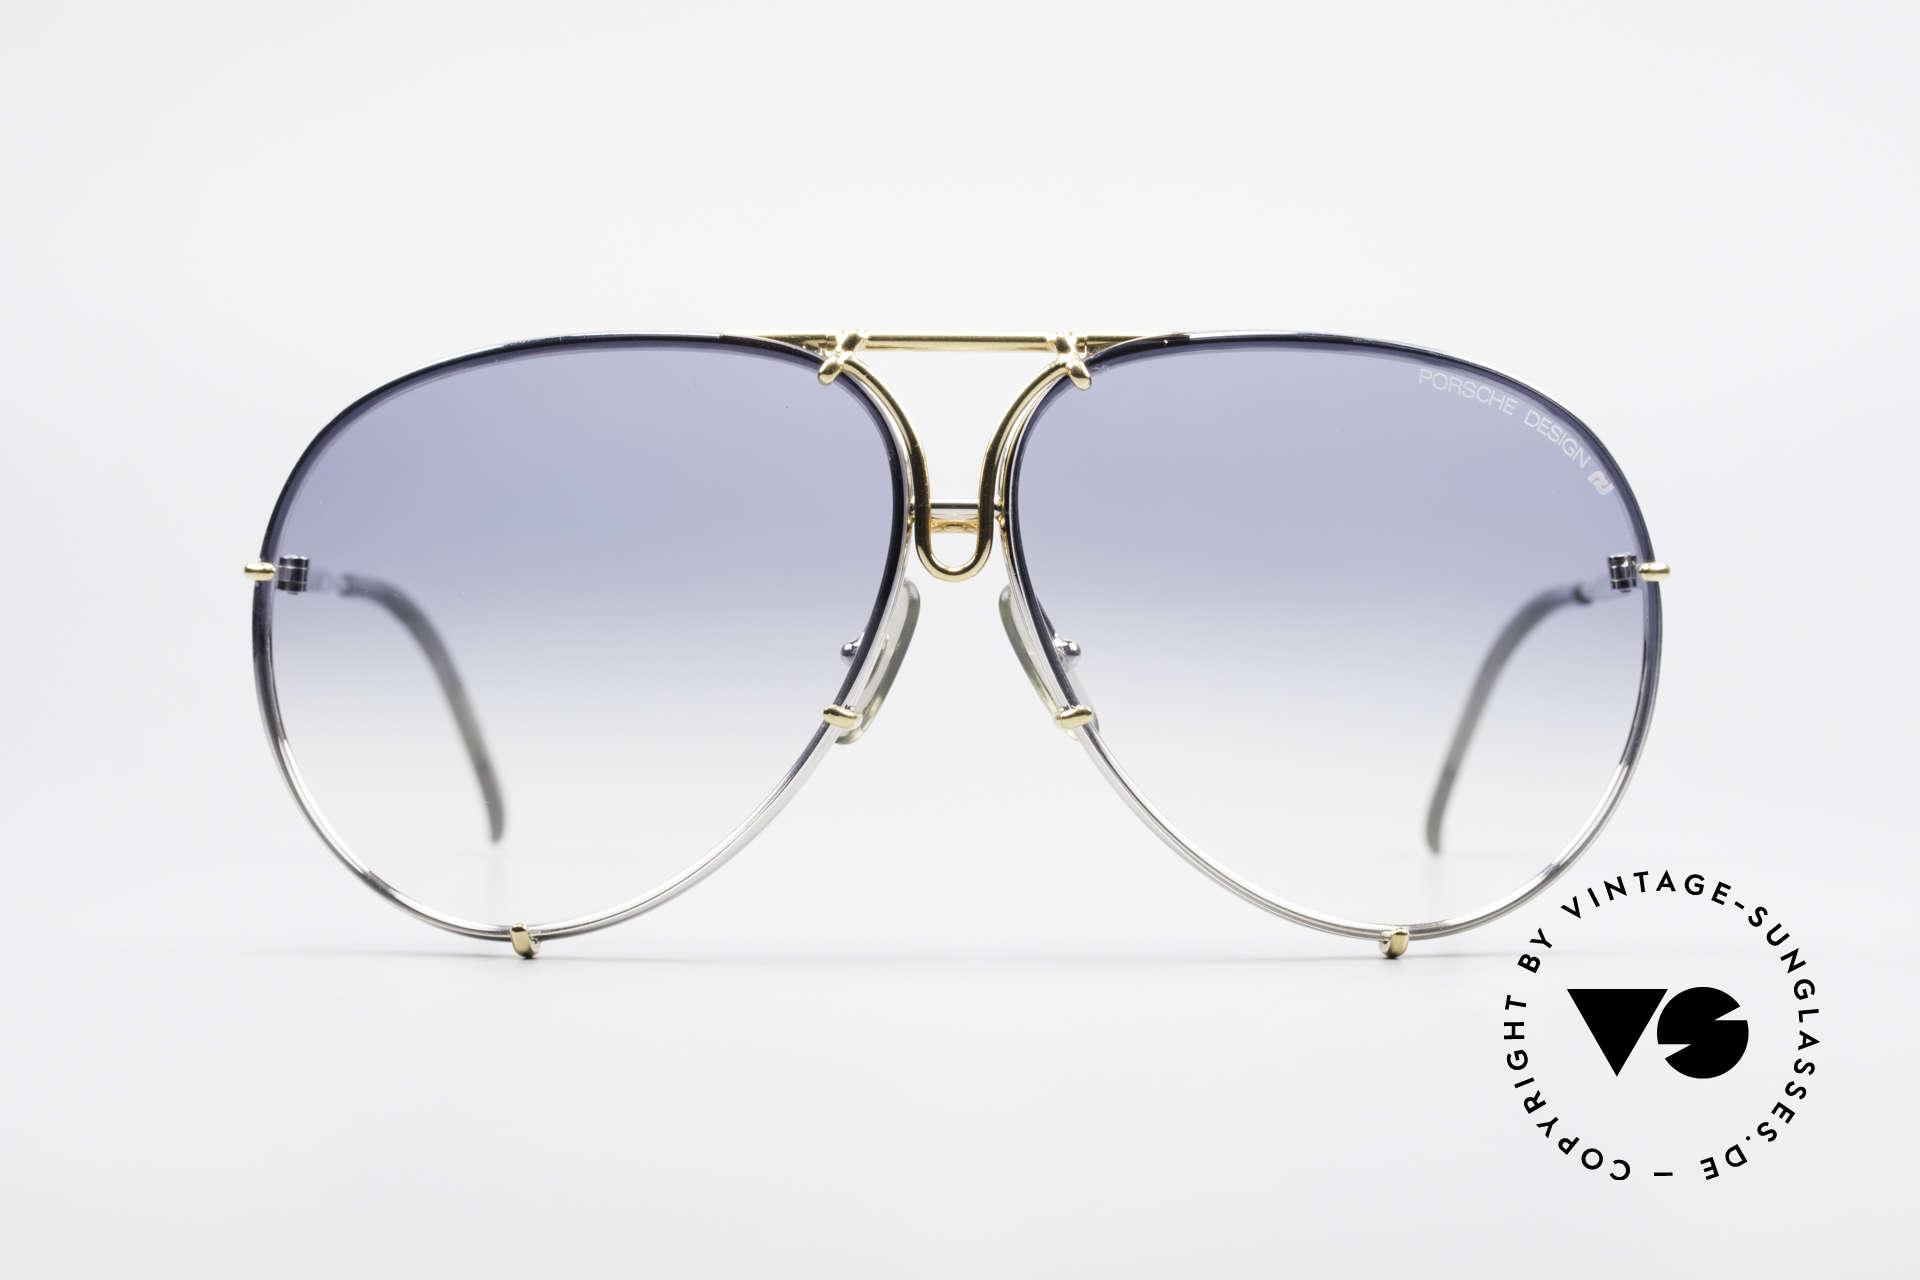 fd9f2505dd3 Sunglasses Porsche 5623 Johnny Depp Black Mass Shades